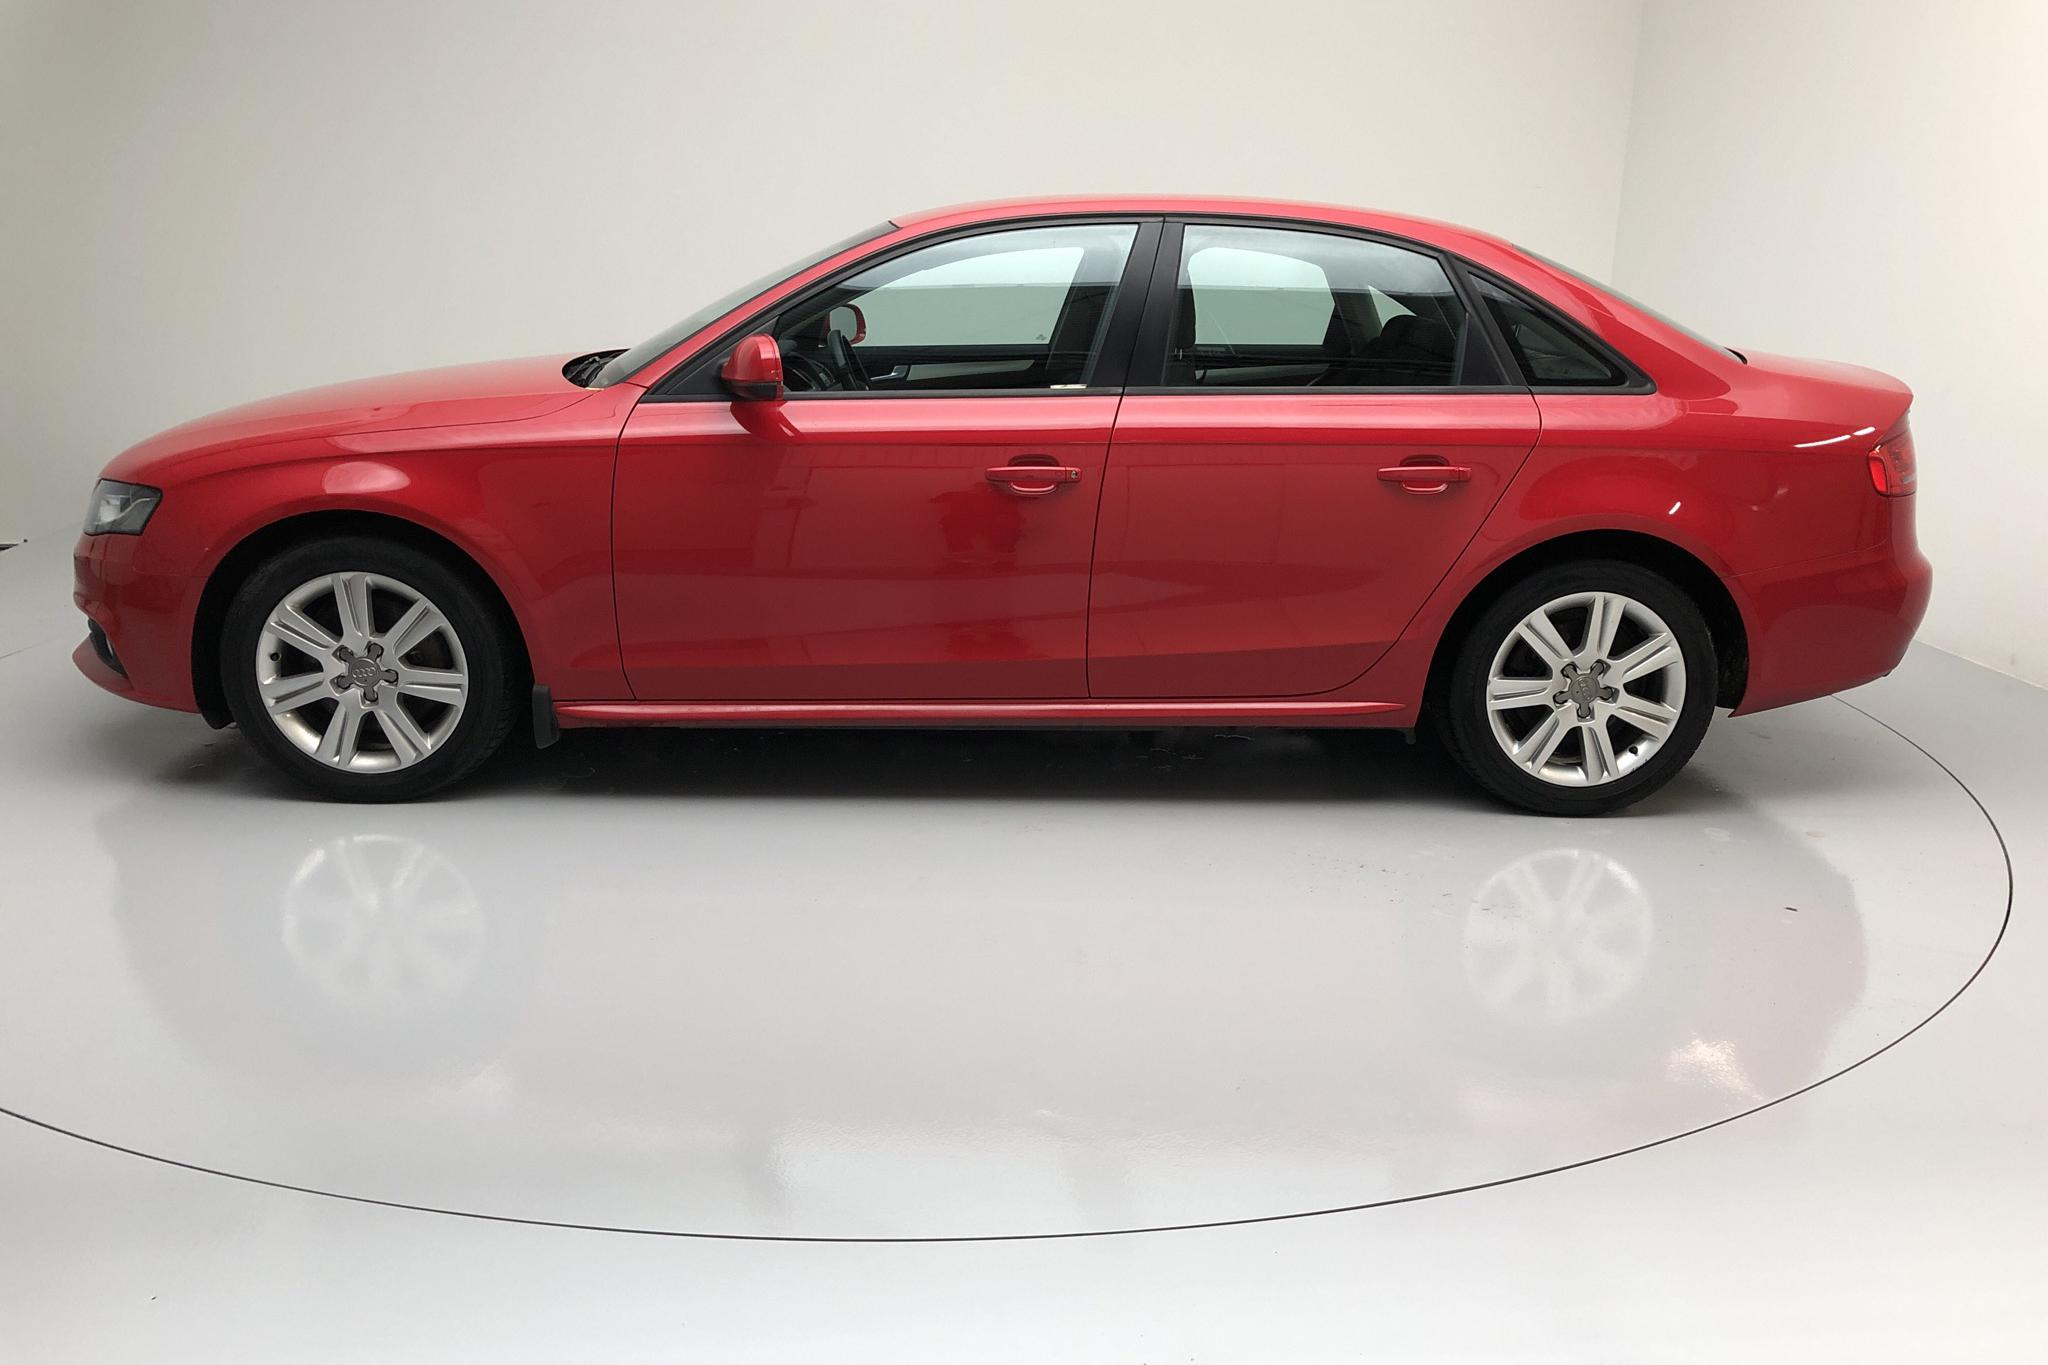 Audi A4 2.0 TFSI quattro (211hk) - 170 000 km - Manual - red - 2011